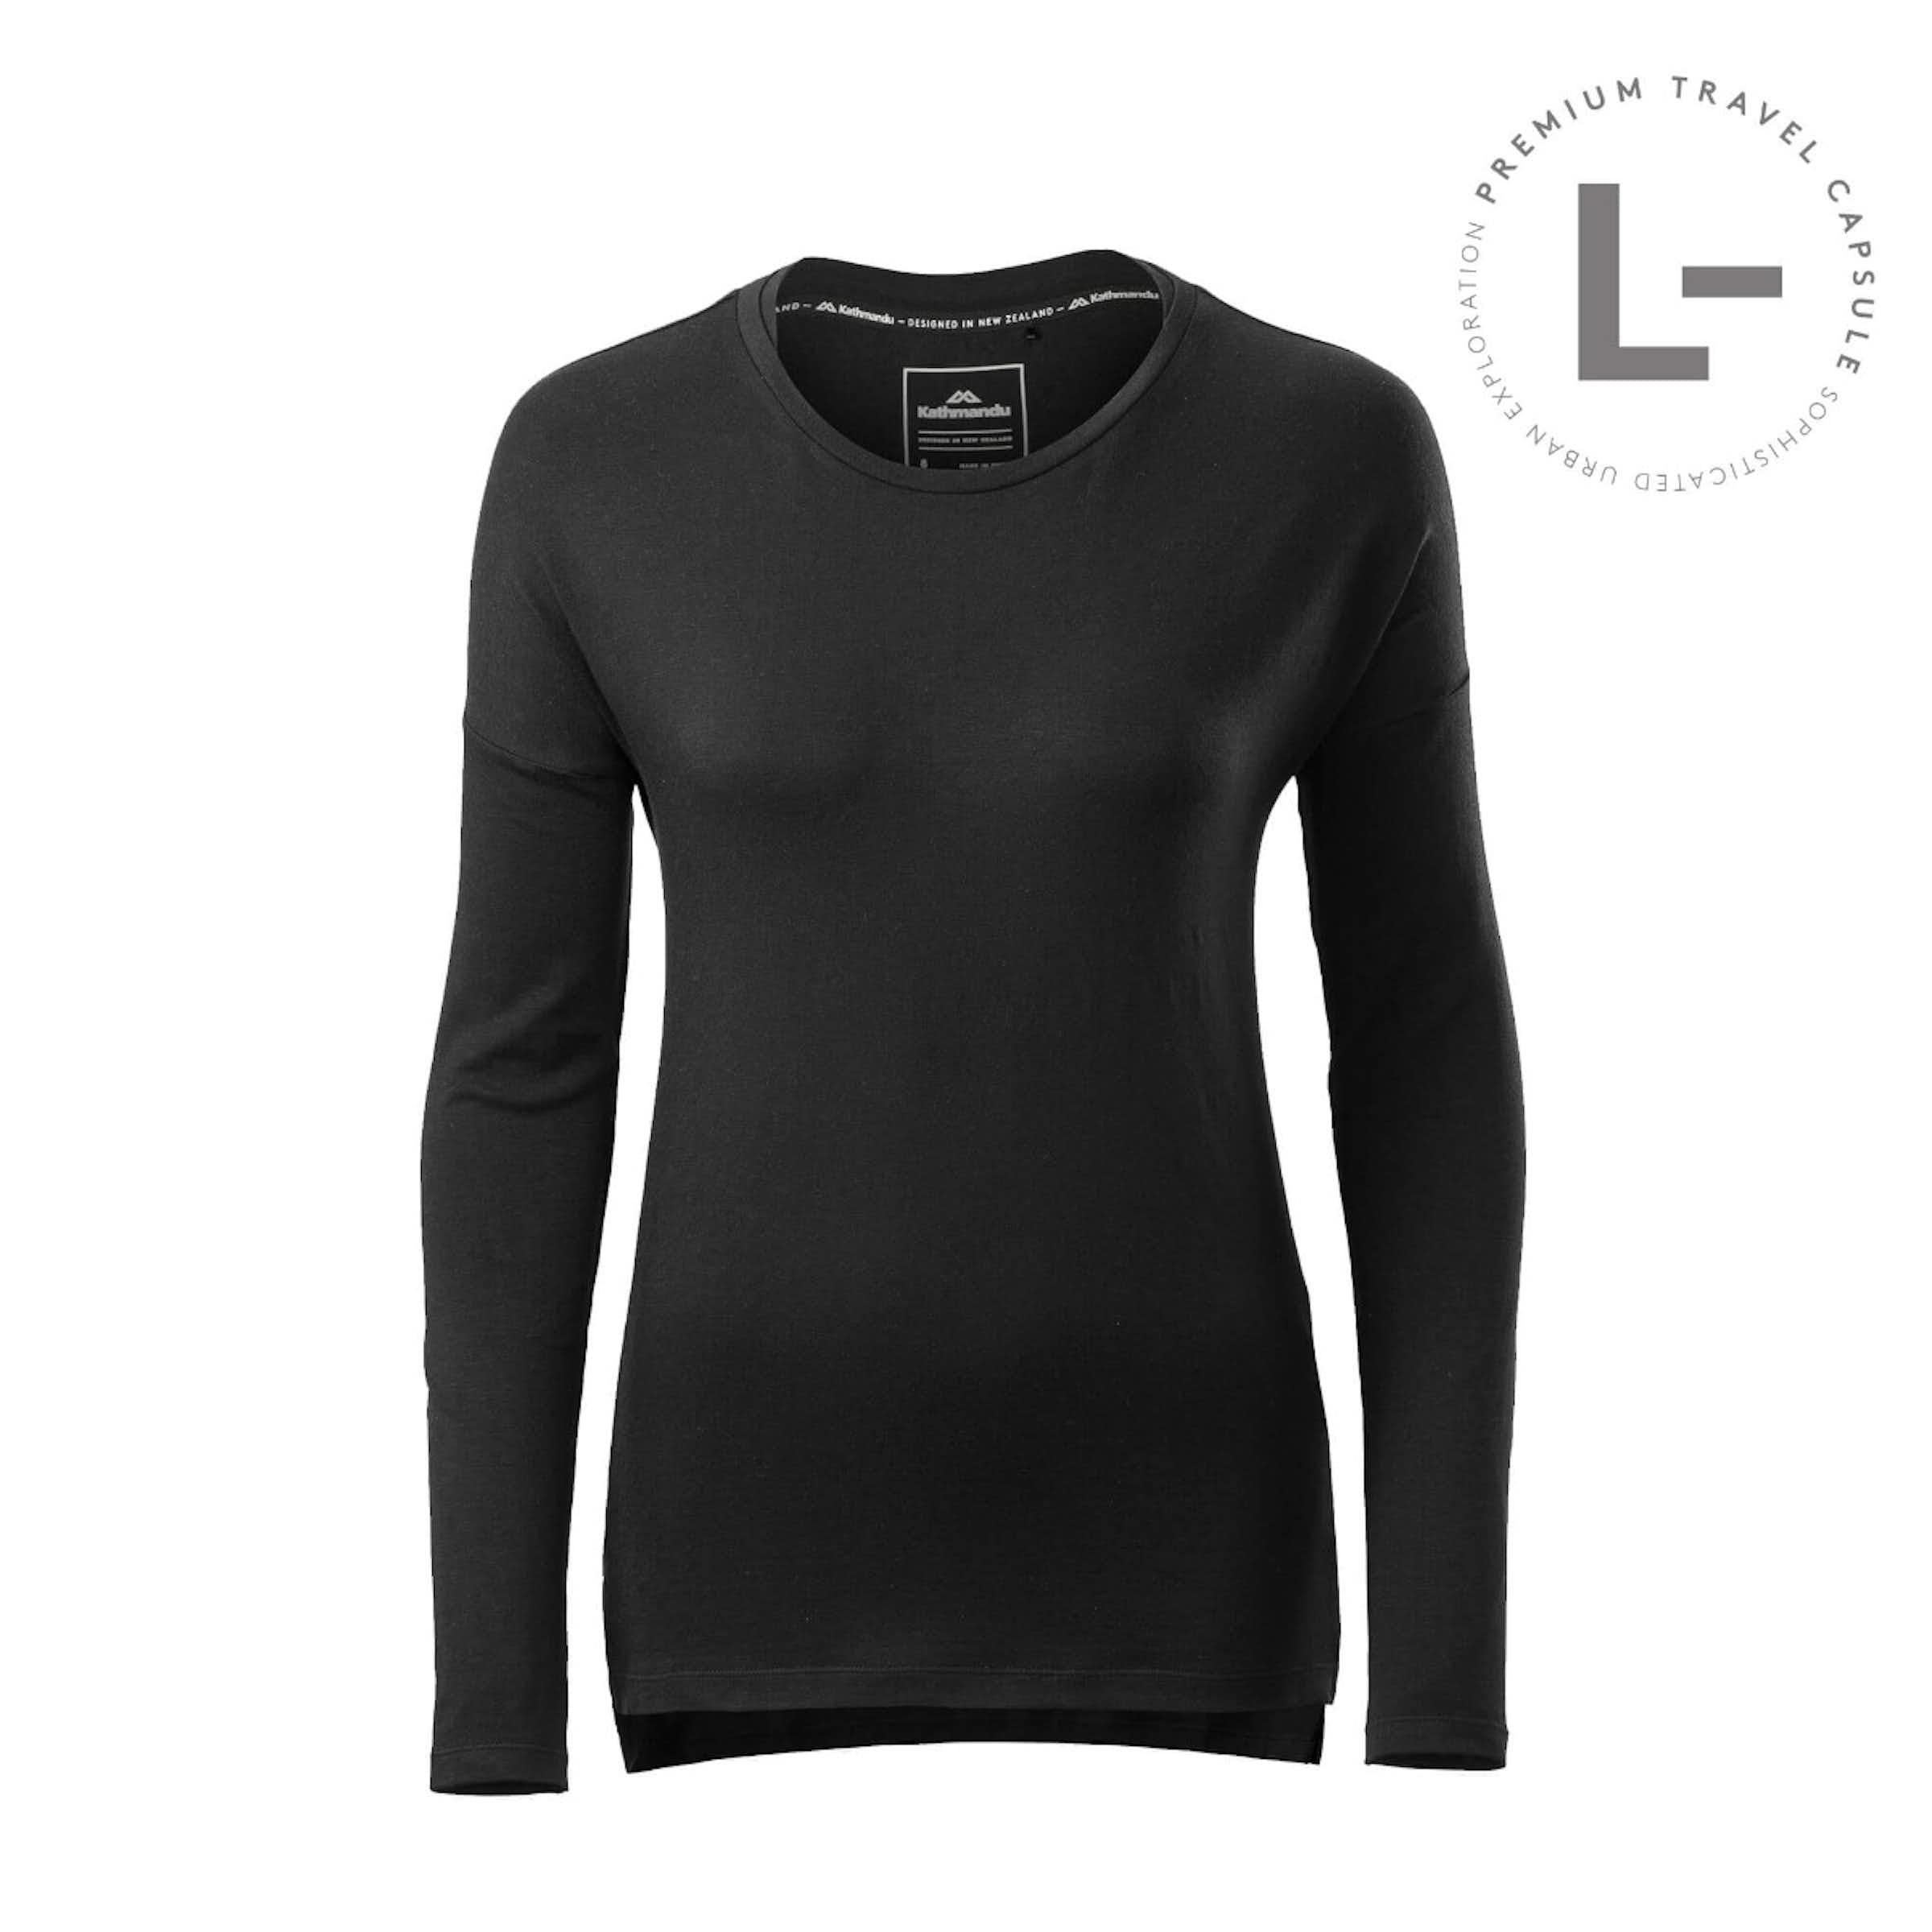 688388db Tops for Women: T-shirts & Shirts Online in NZ| Kathmandu